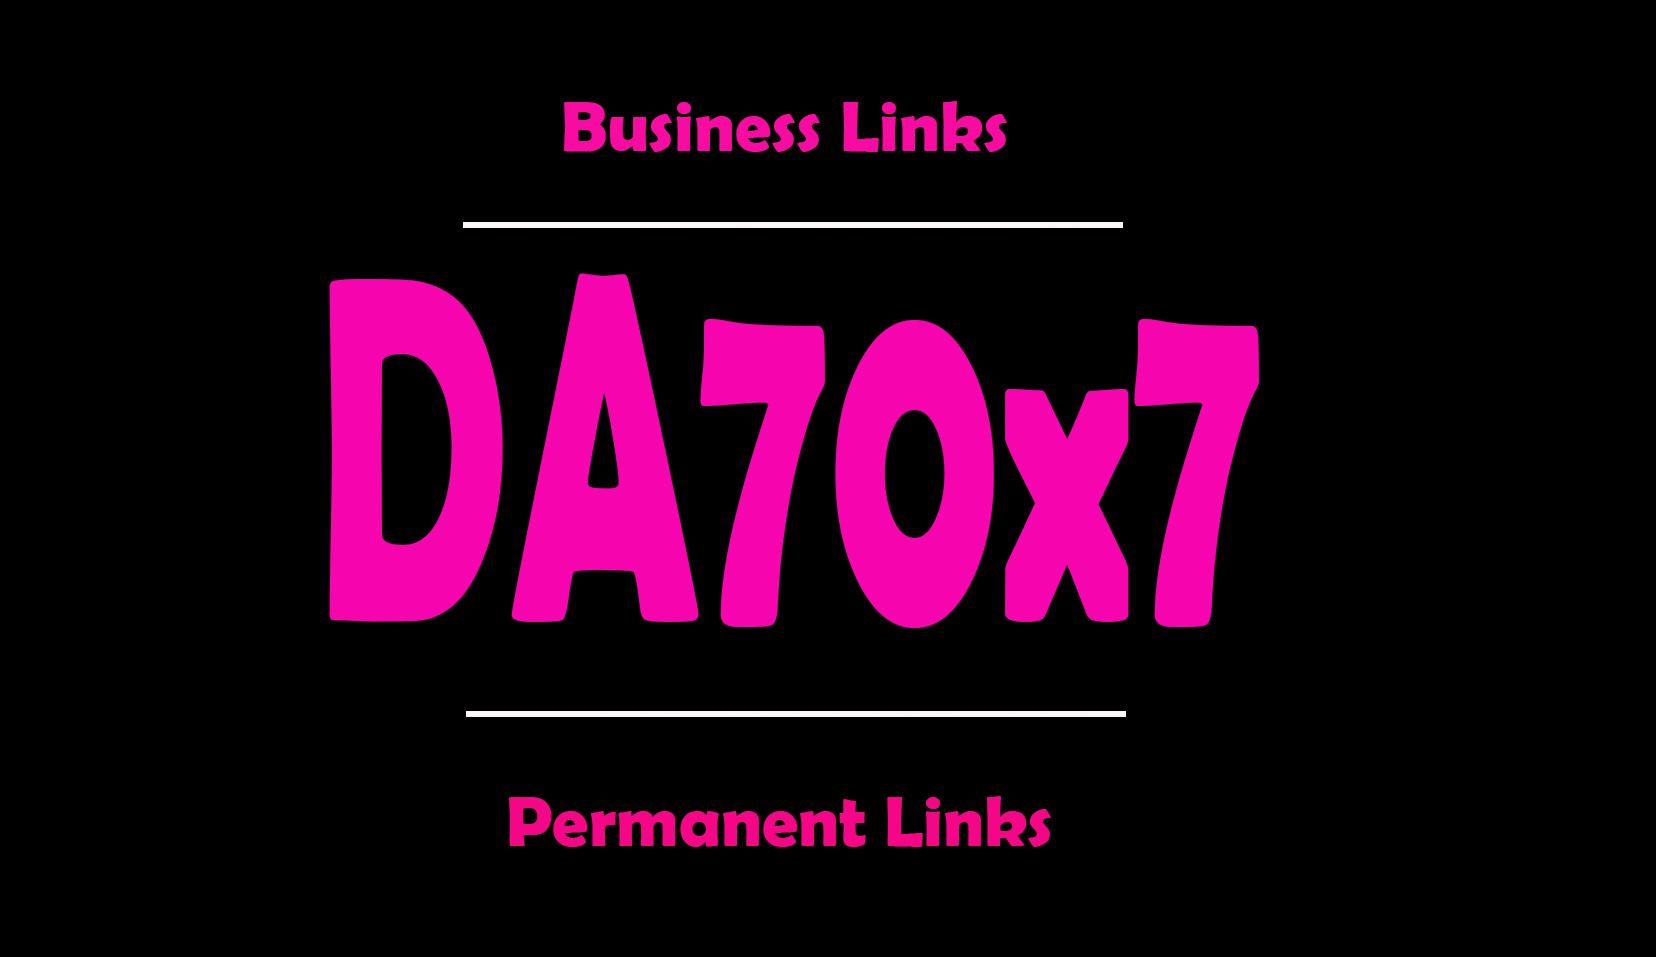 give backlinks DA70x7 business site blogroll permanent